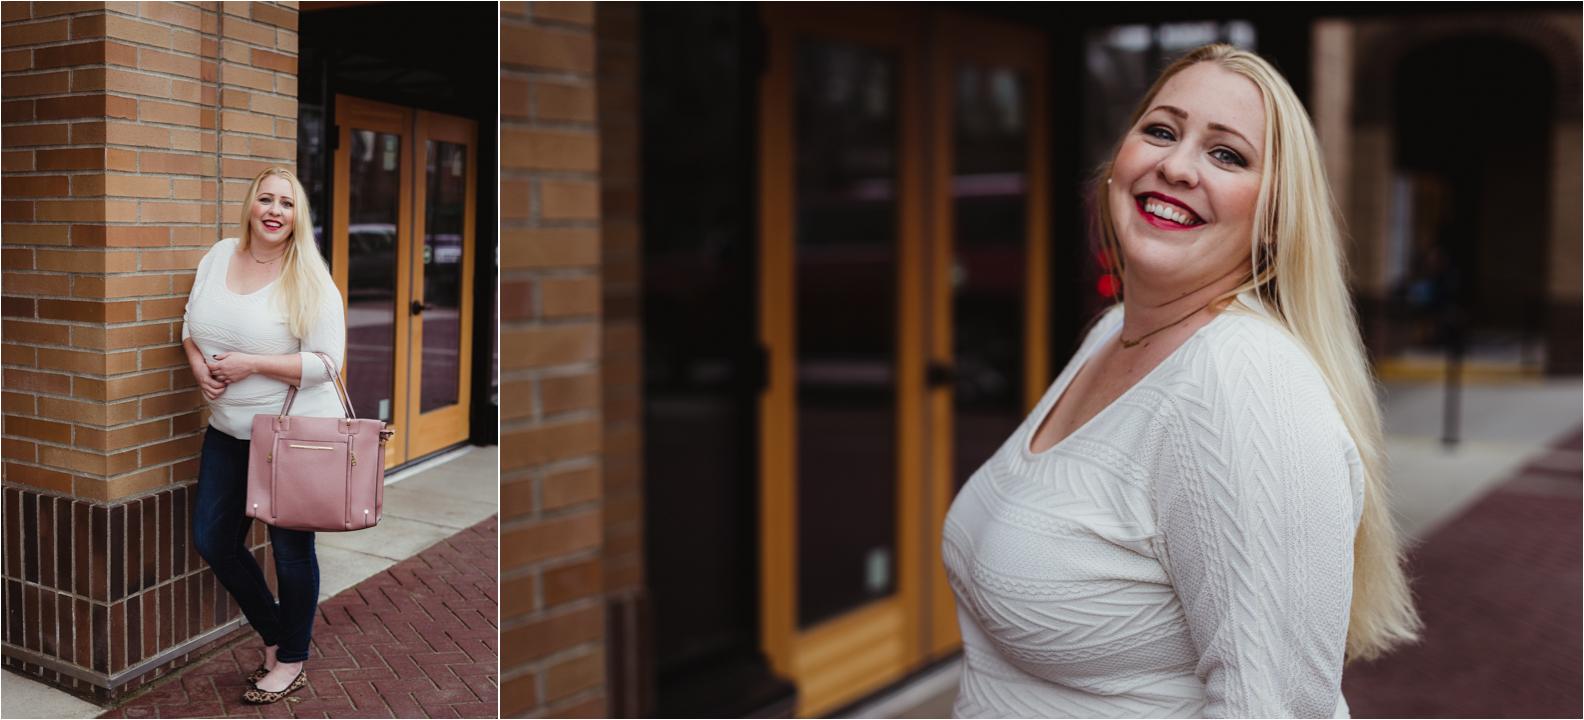 Personal Branding Photographer Lake Oswego